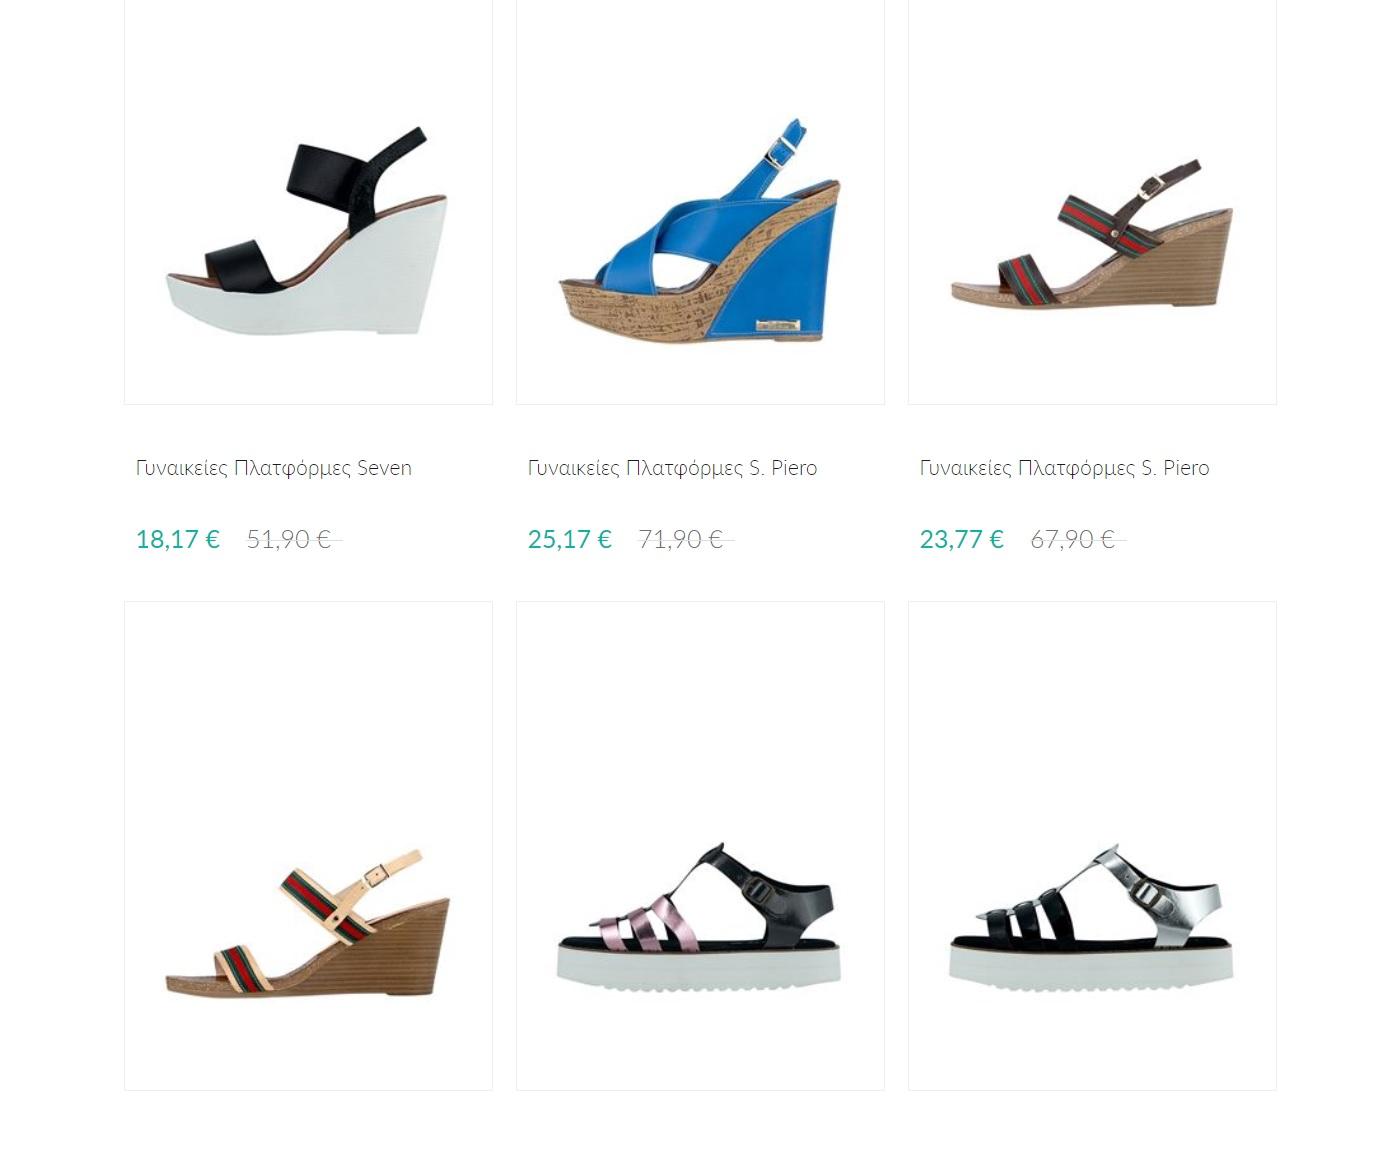 5e937bc6f43 Μεγάλες εκπτώσεις σε προϊόντα Alouette και γυναικεία παπούτσια ...